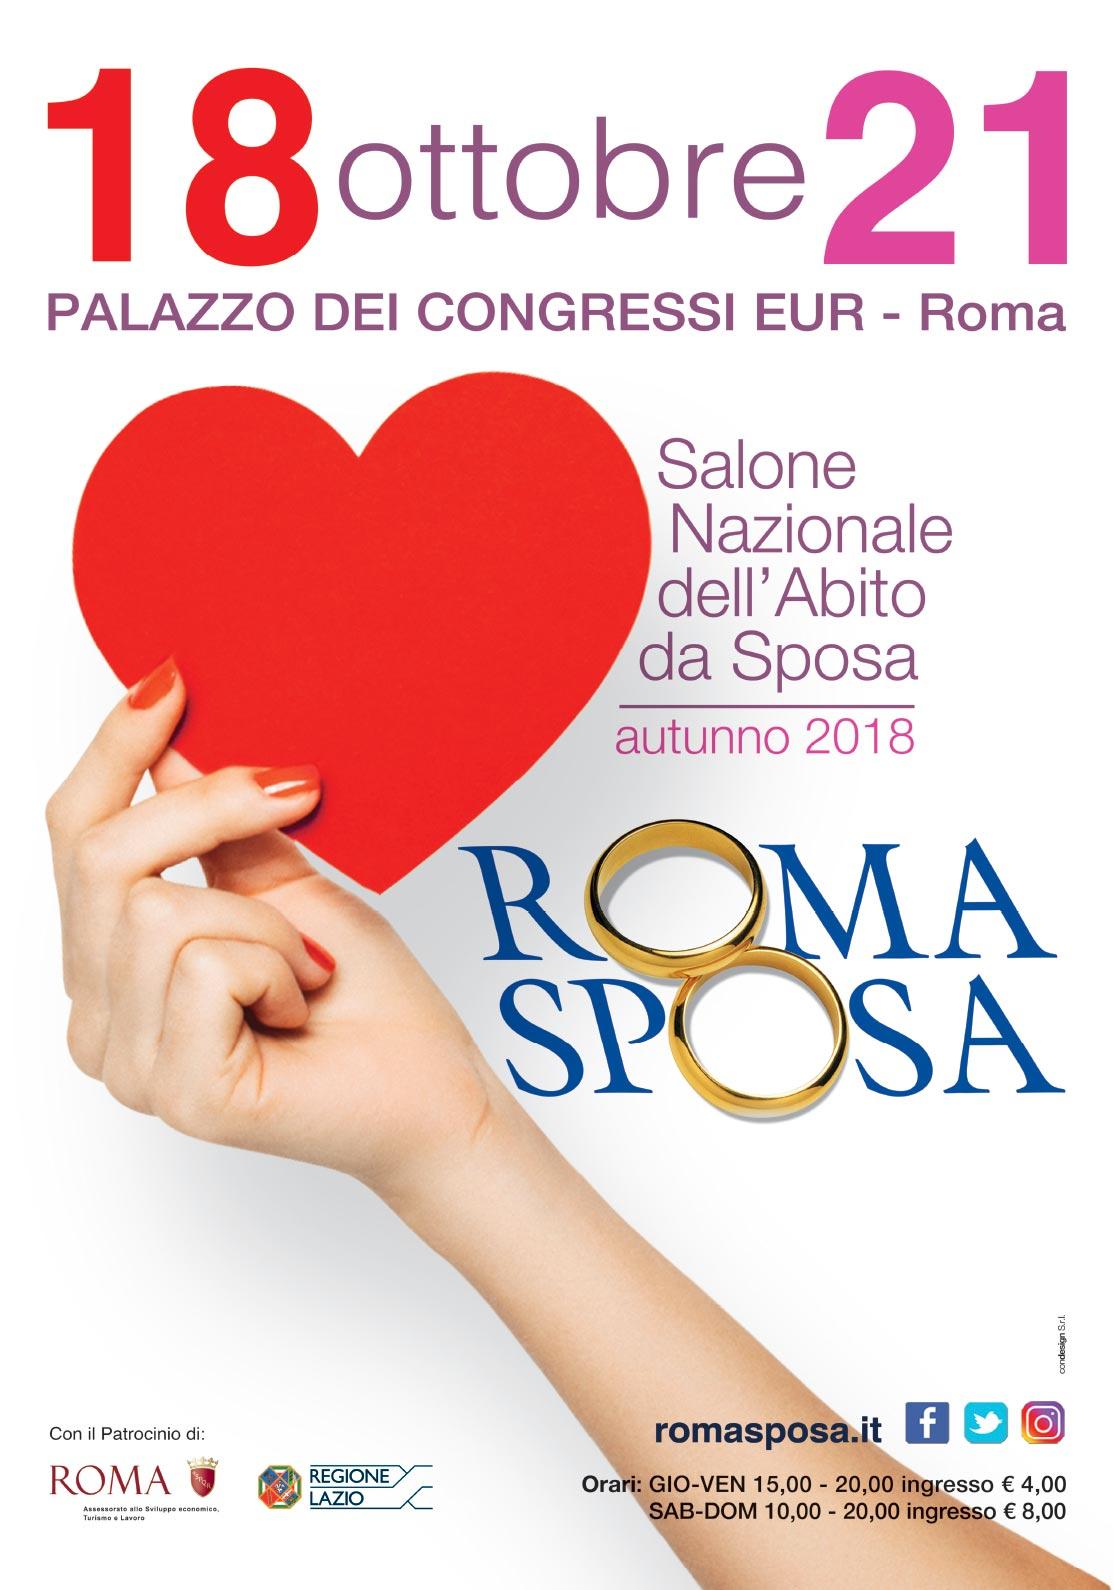 locandina roma sposa 2019